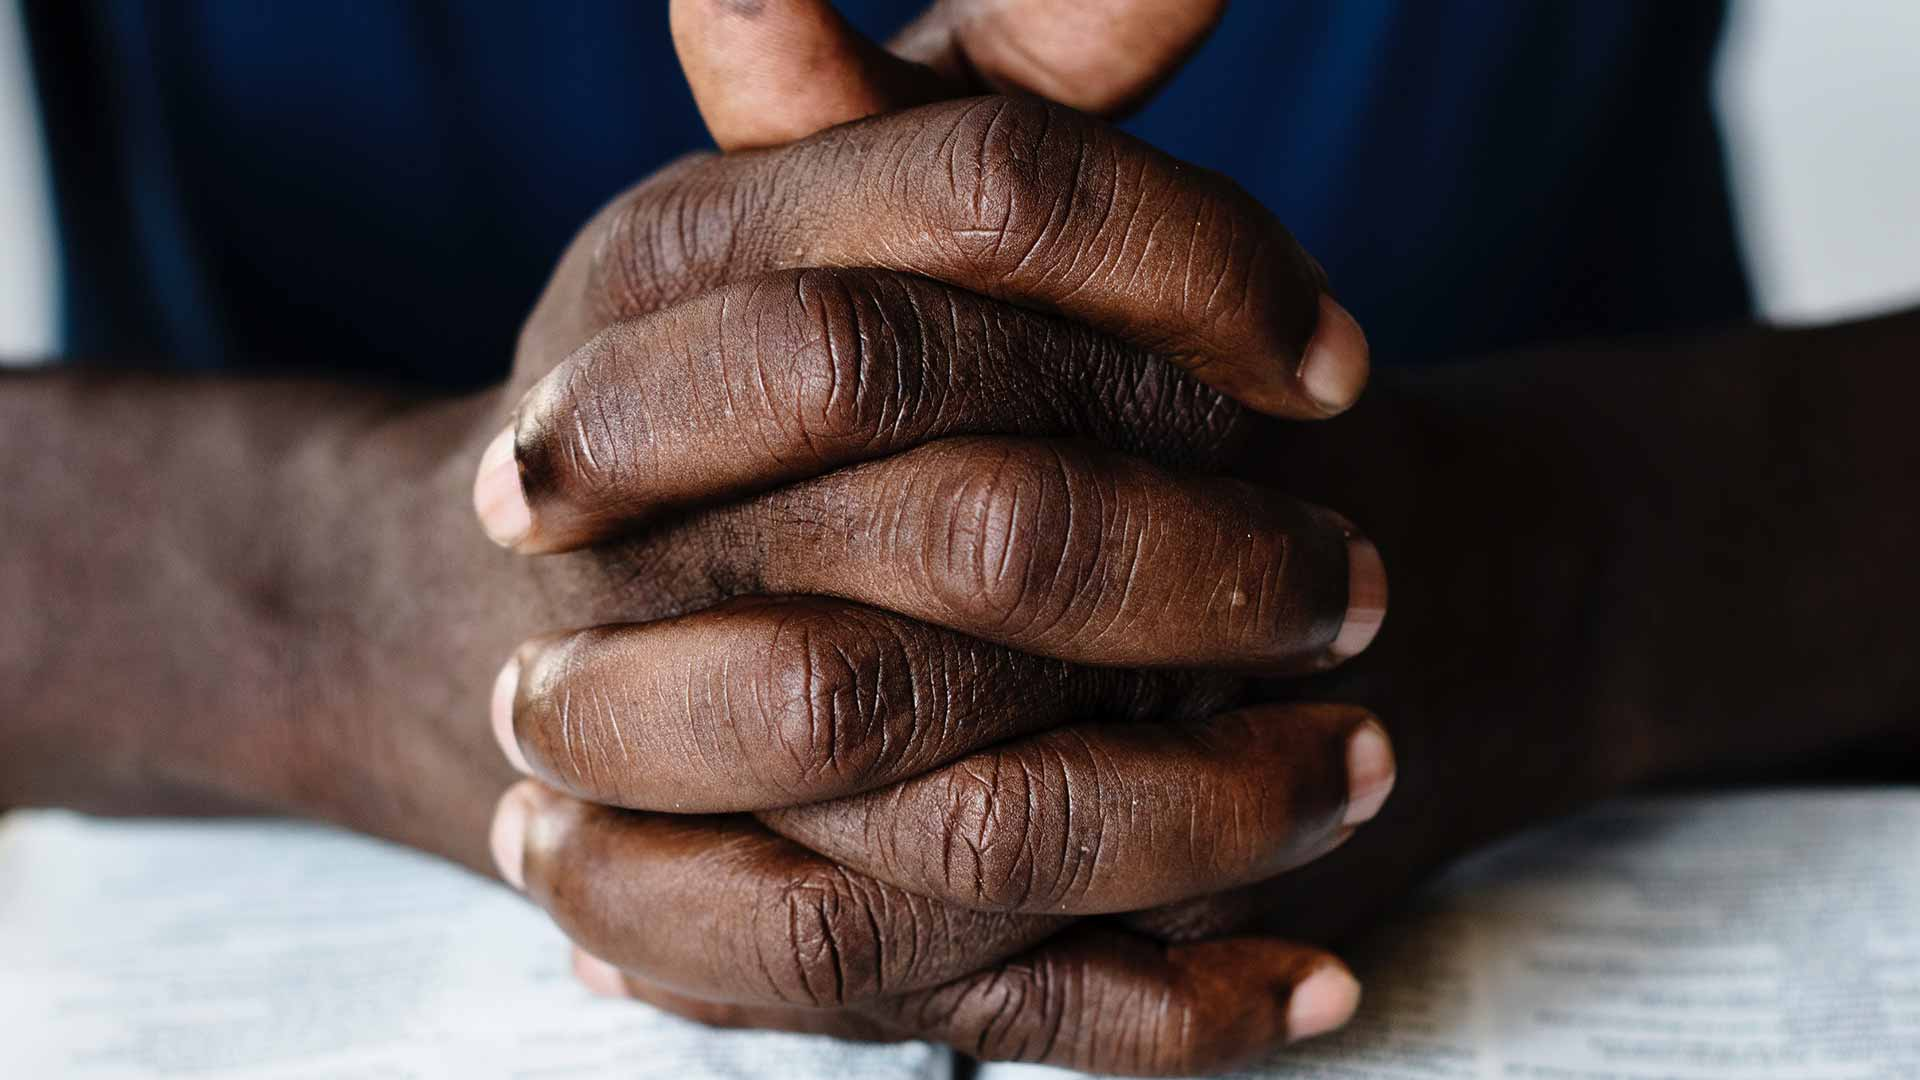 Black man's hands folded in prayer